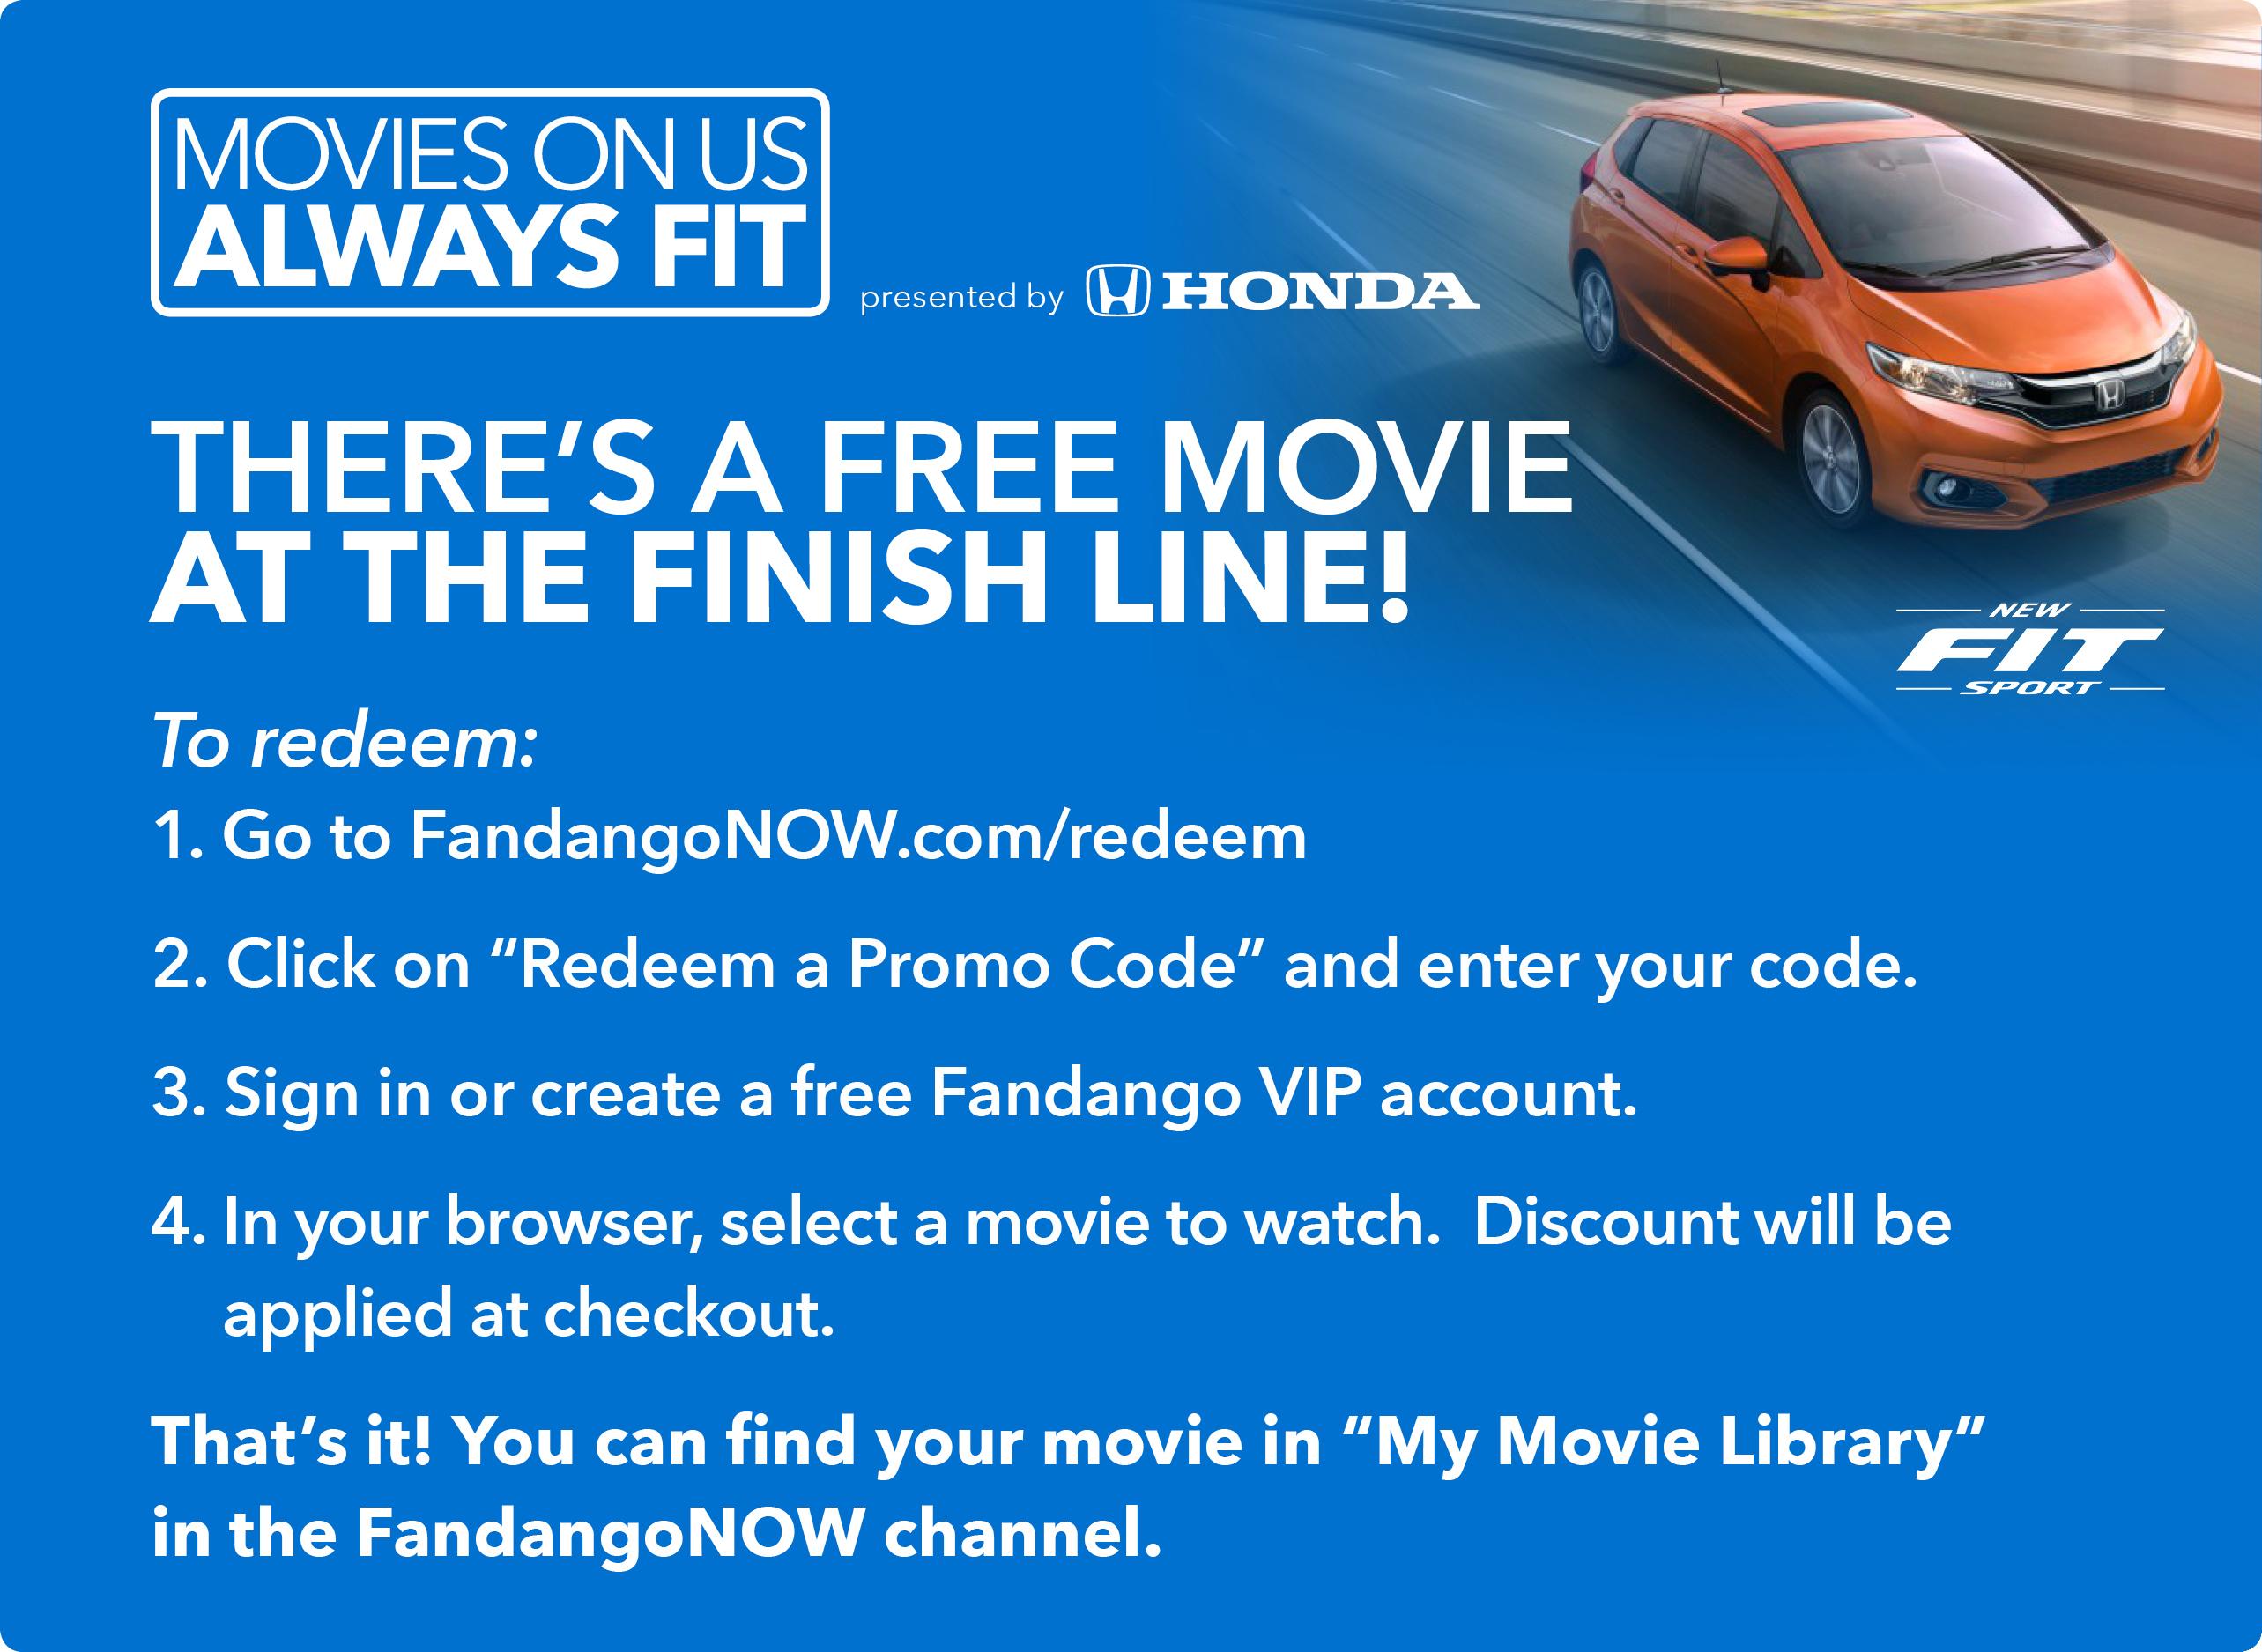 ROKU USERS** free $4 99 credit for movie rental @ FandangoNow YMMV